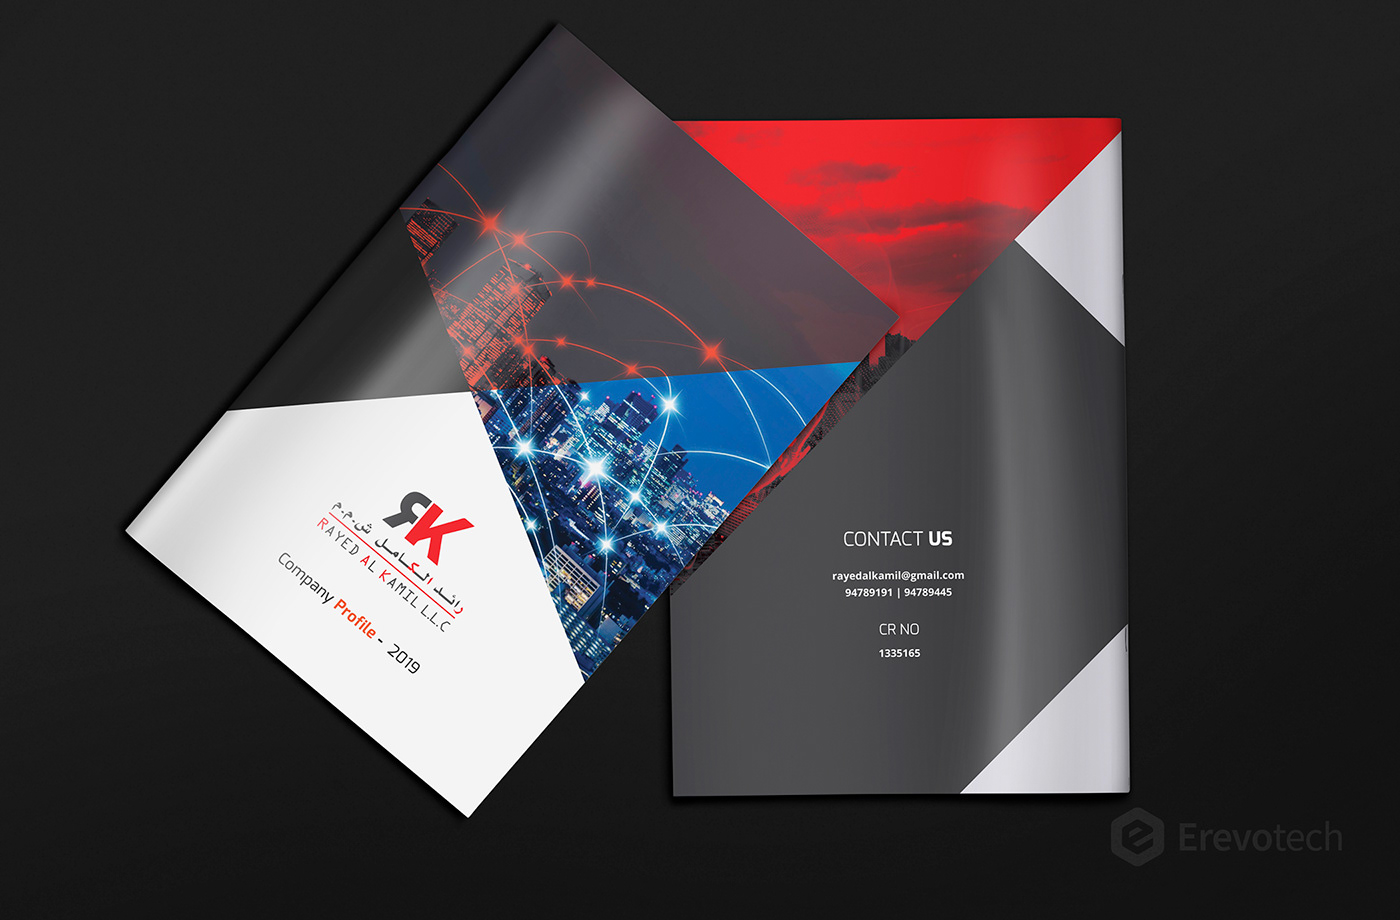 Adobe InDesign,company profile,erevotech,kabeerkhan,Oman,profile,profile design,rayed al kamil